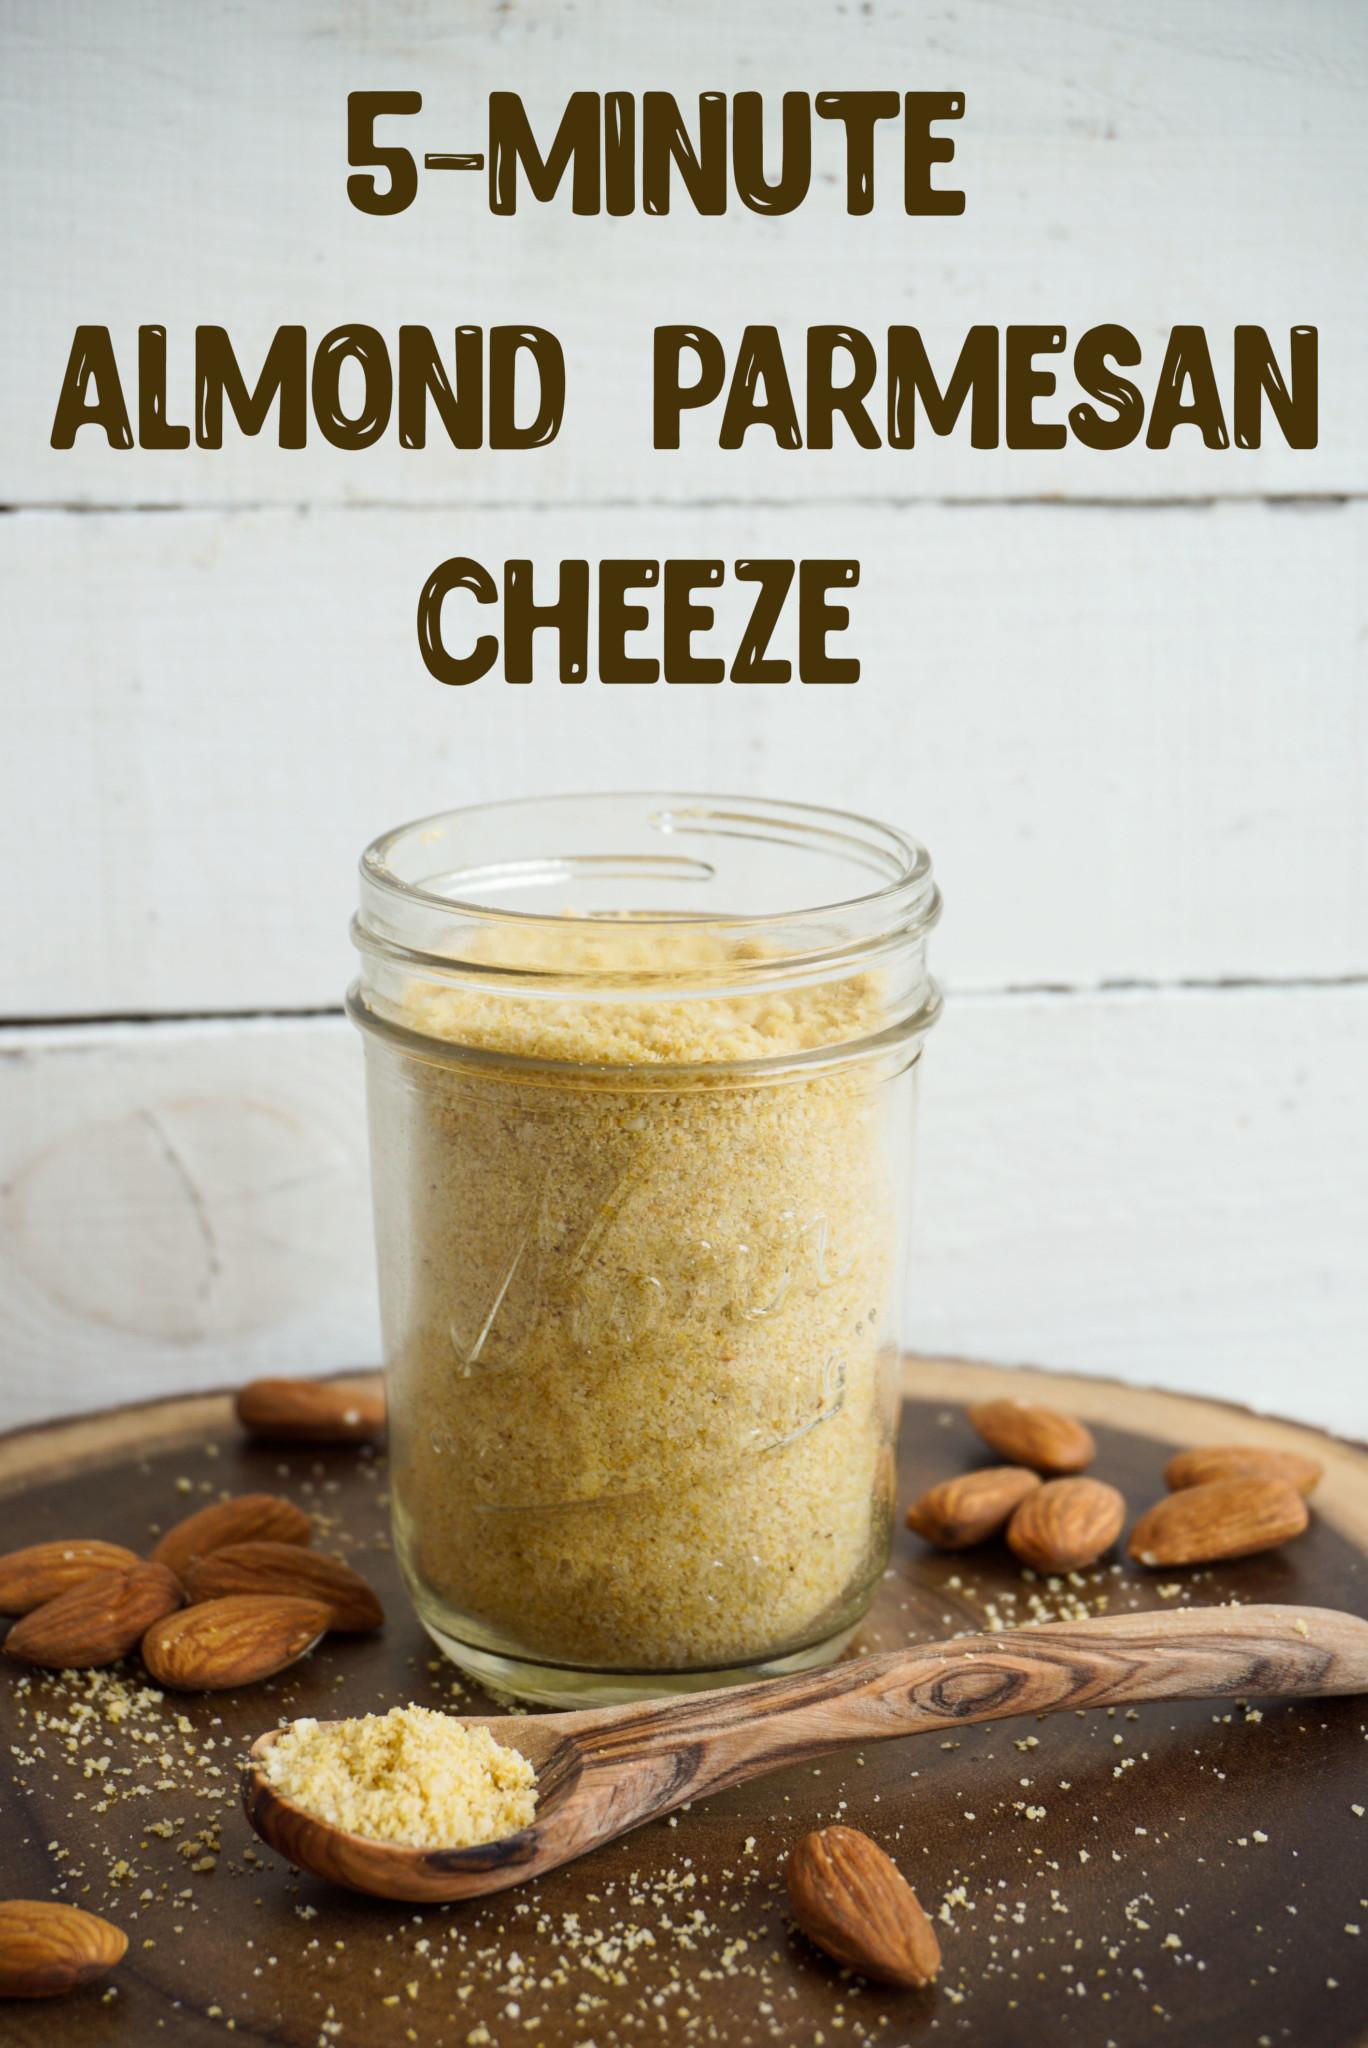 Almond Parmesan Cheeze - The Tasty K